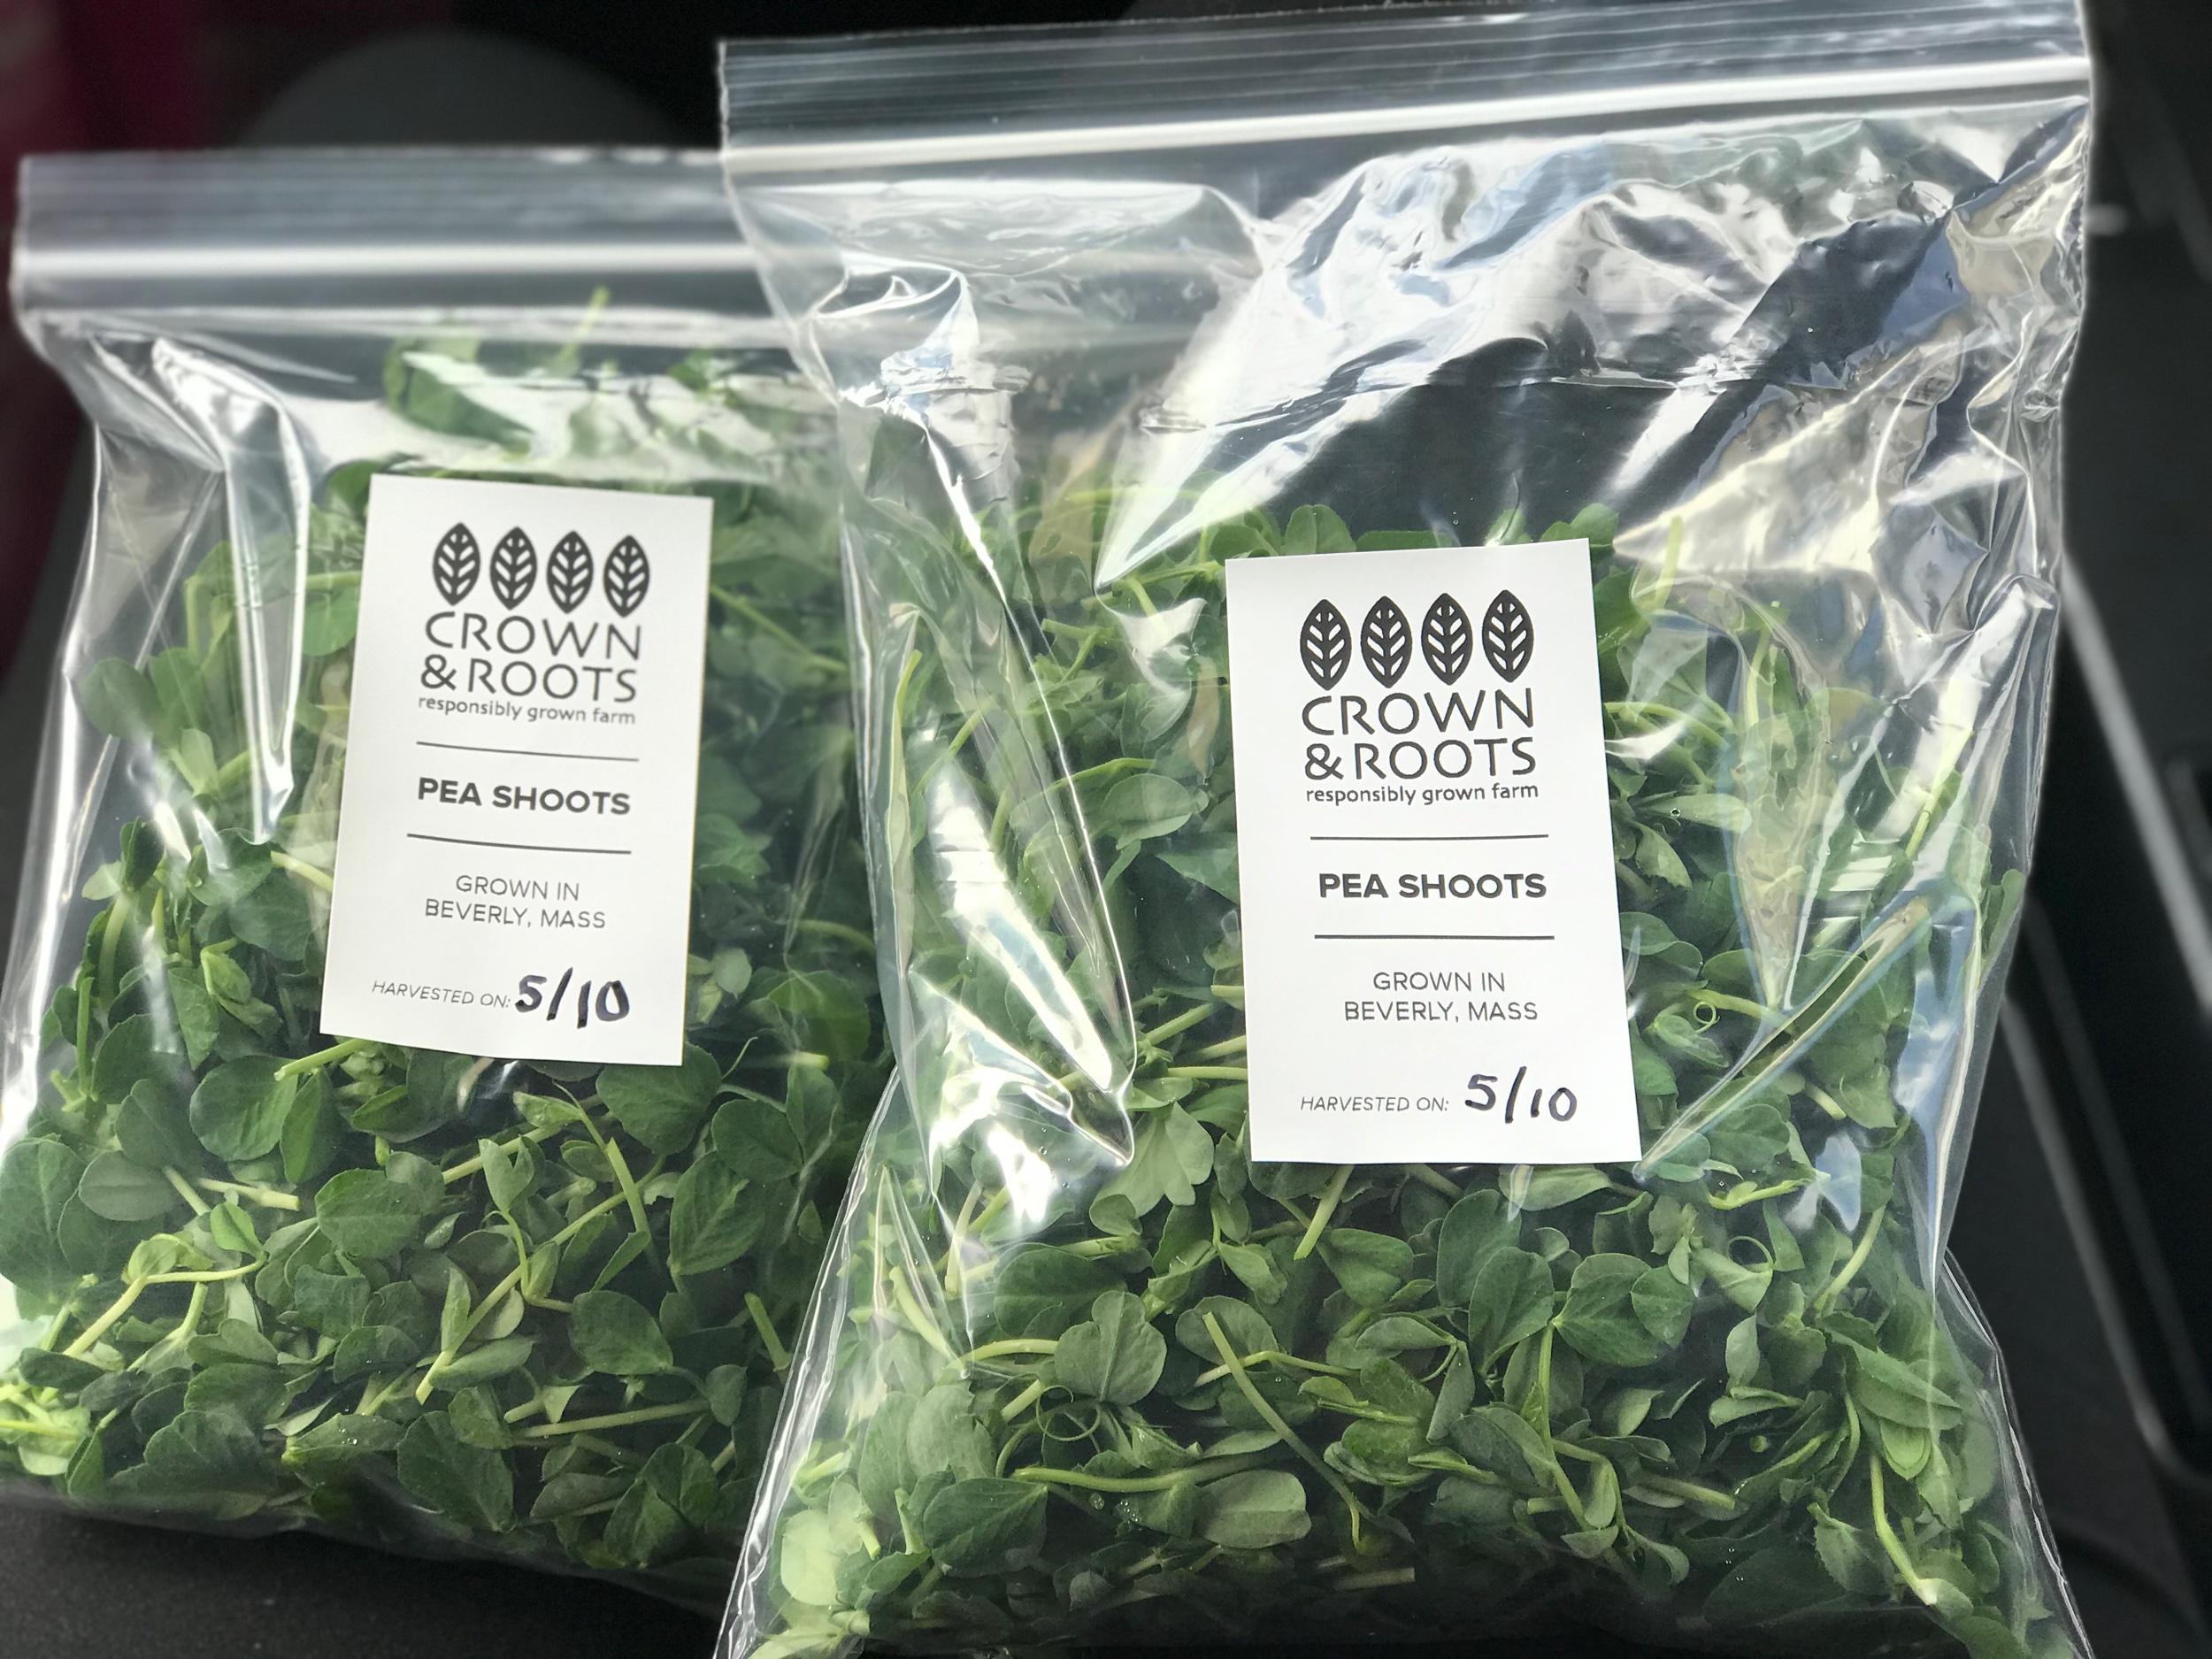 Pea Shoots — 1/4 pound bags